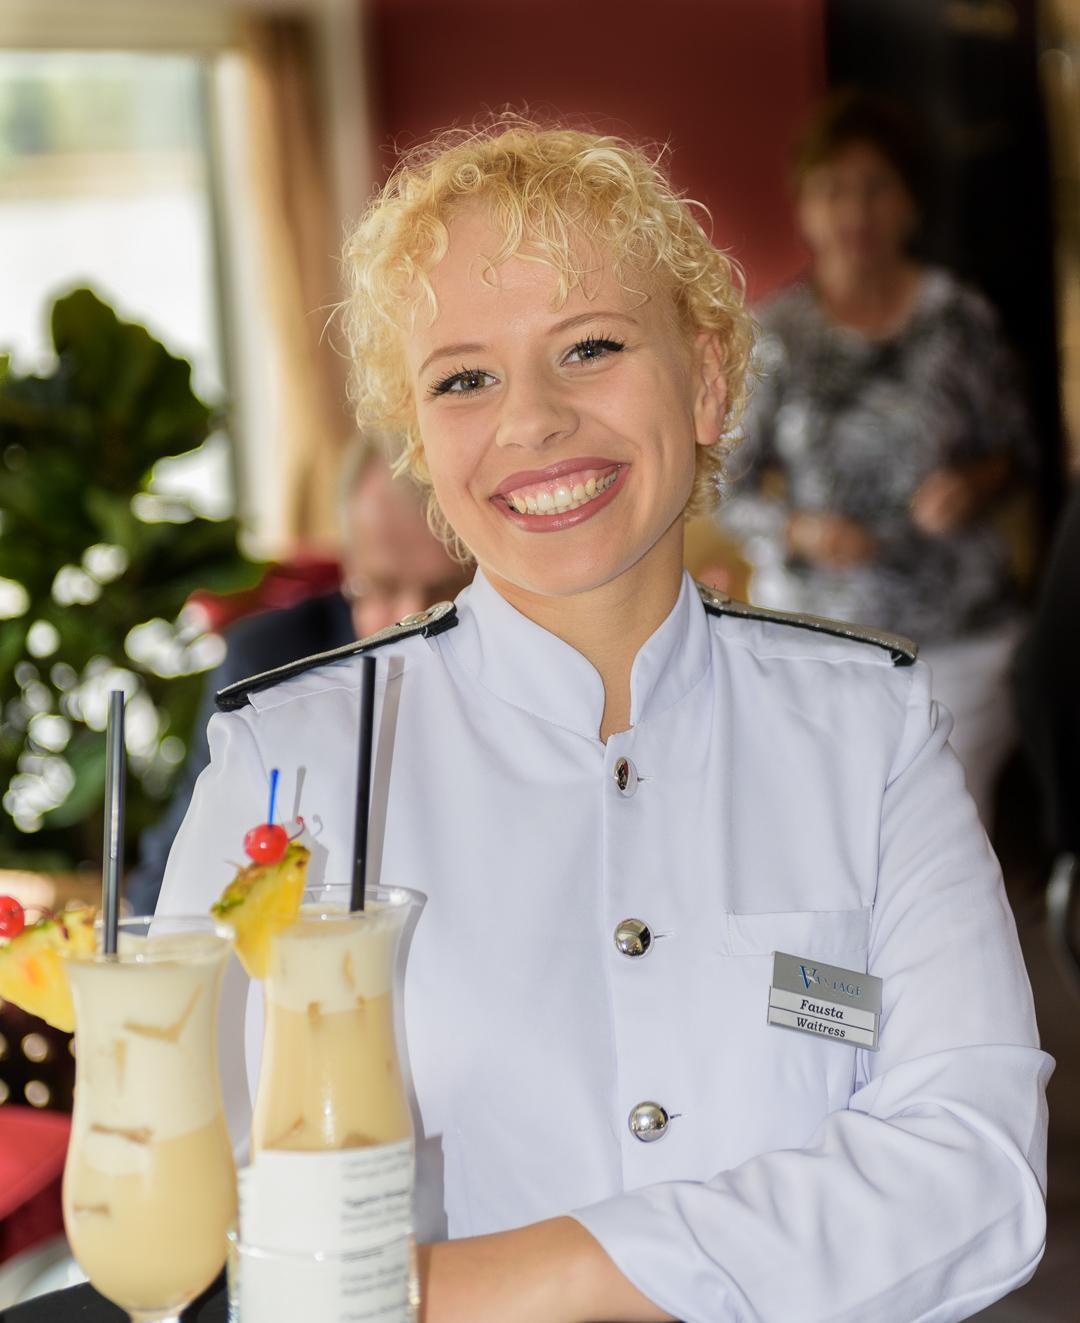 Vantage Waiter